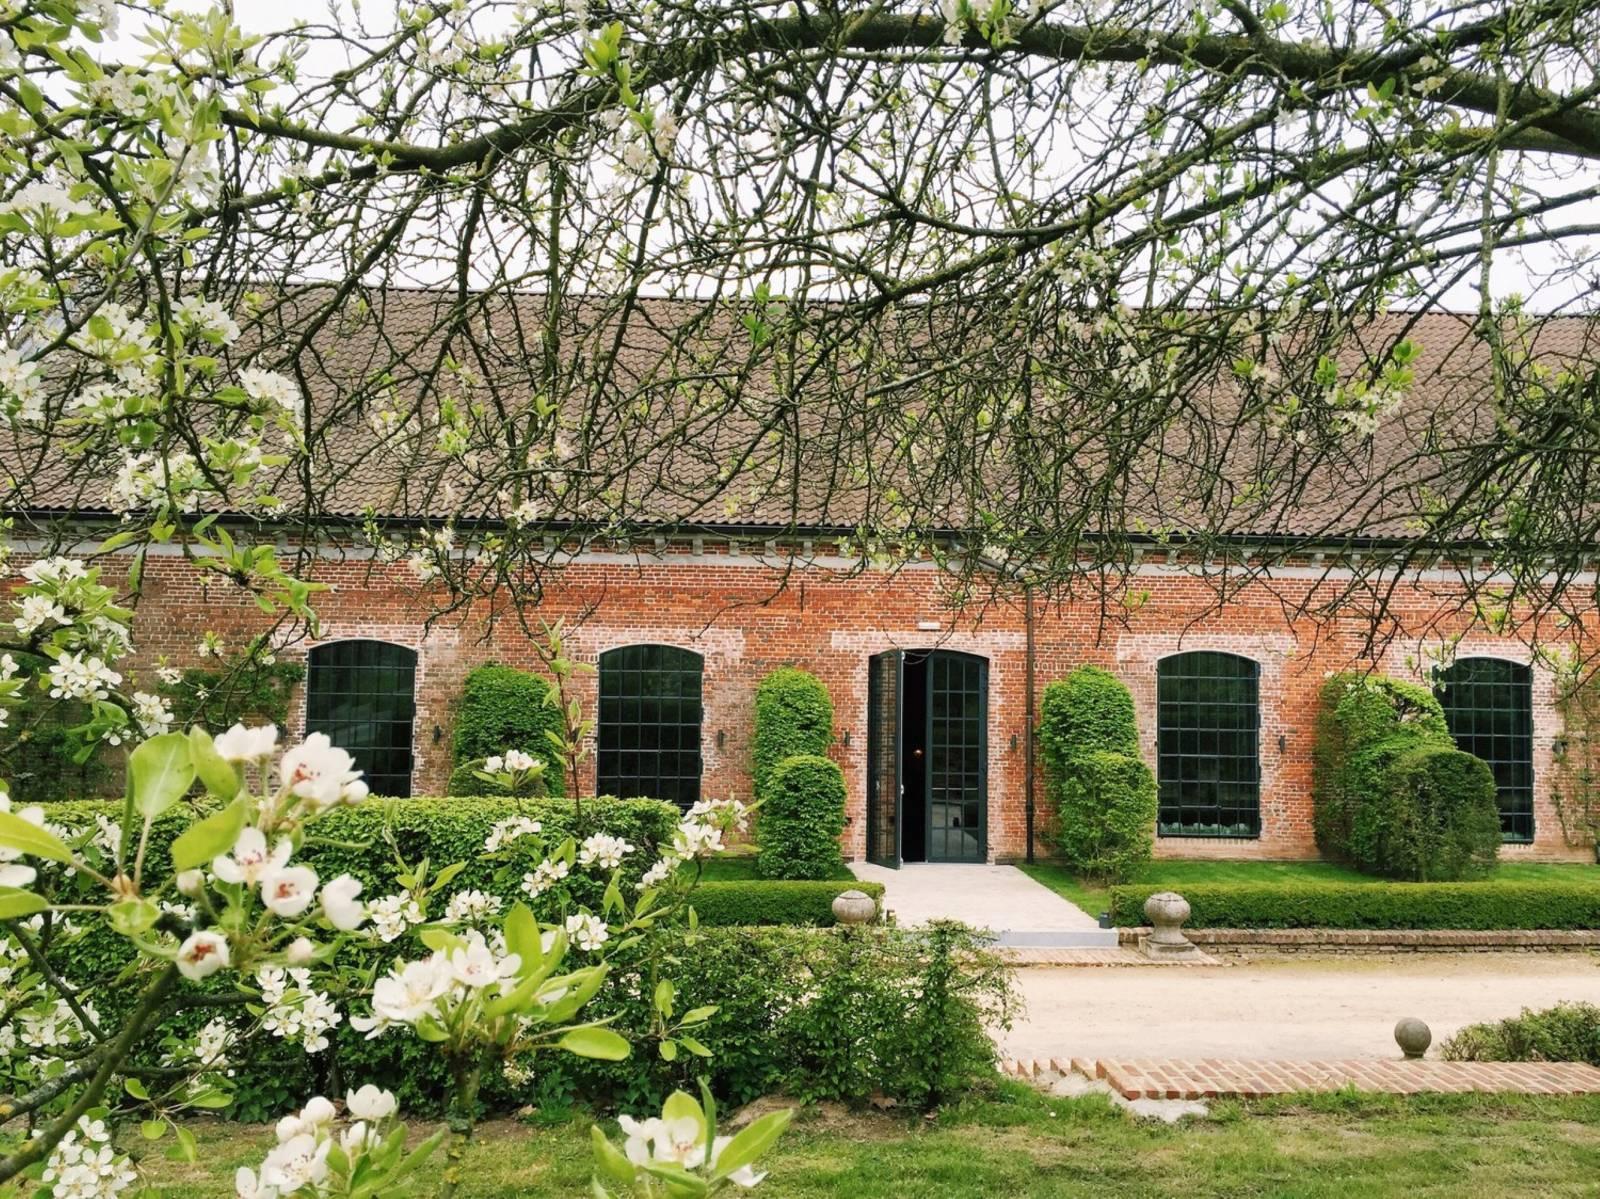 La ferme de Balingue House of Weddings feestzaal salle de fete lieu exceptionnel huwelijk mariage trouwen trouwzaal Brusse (9)